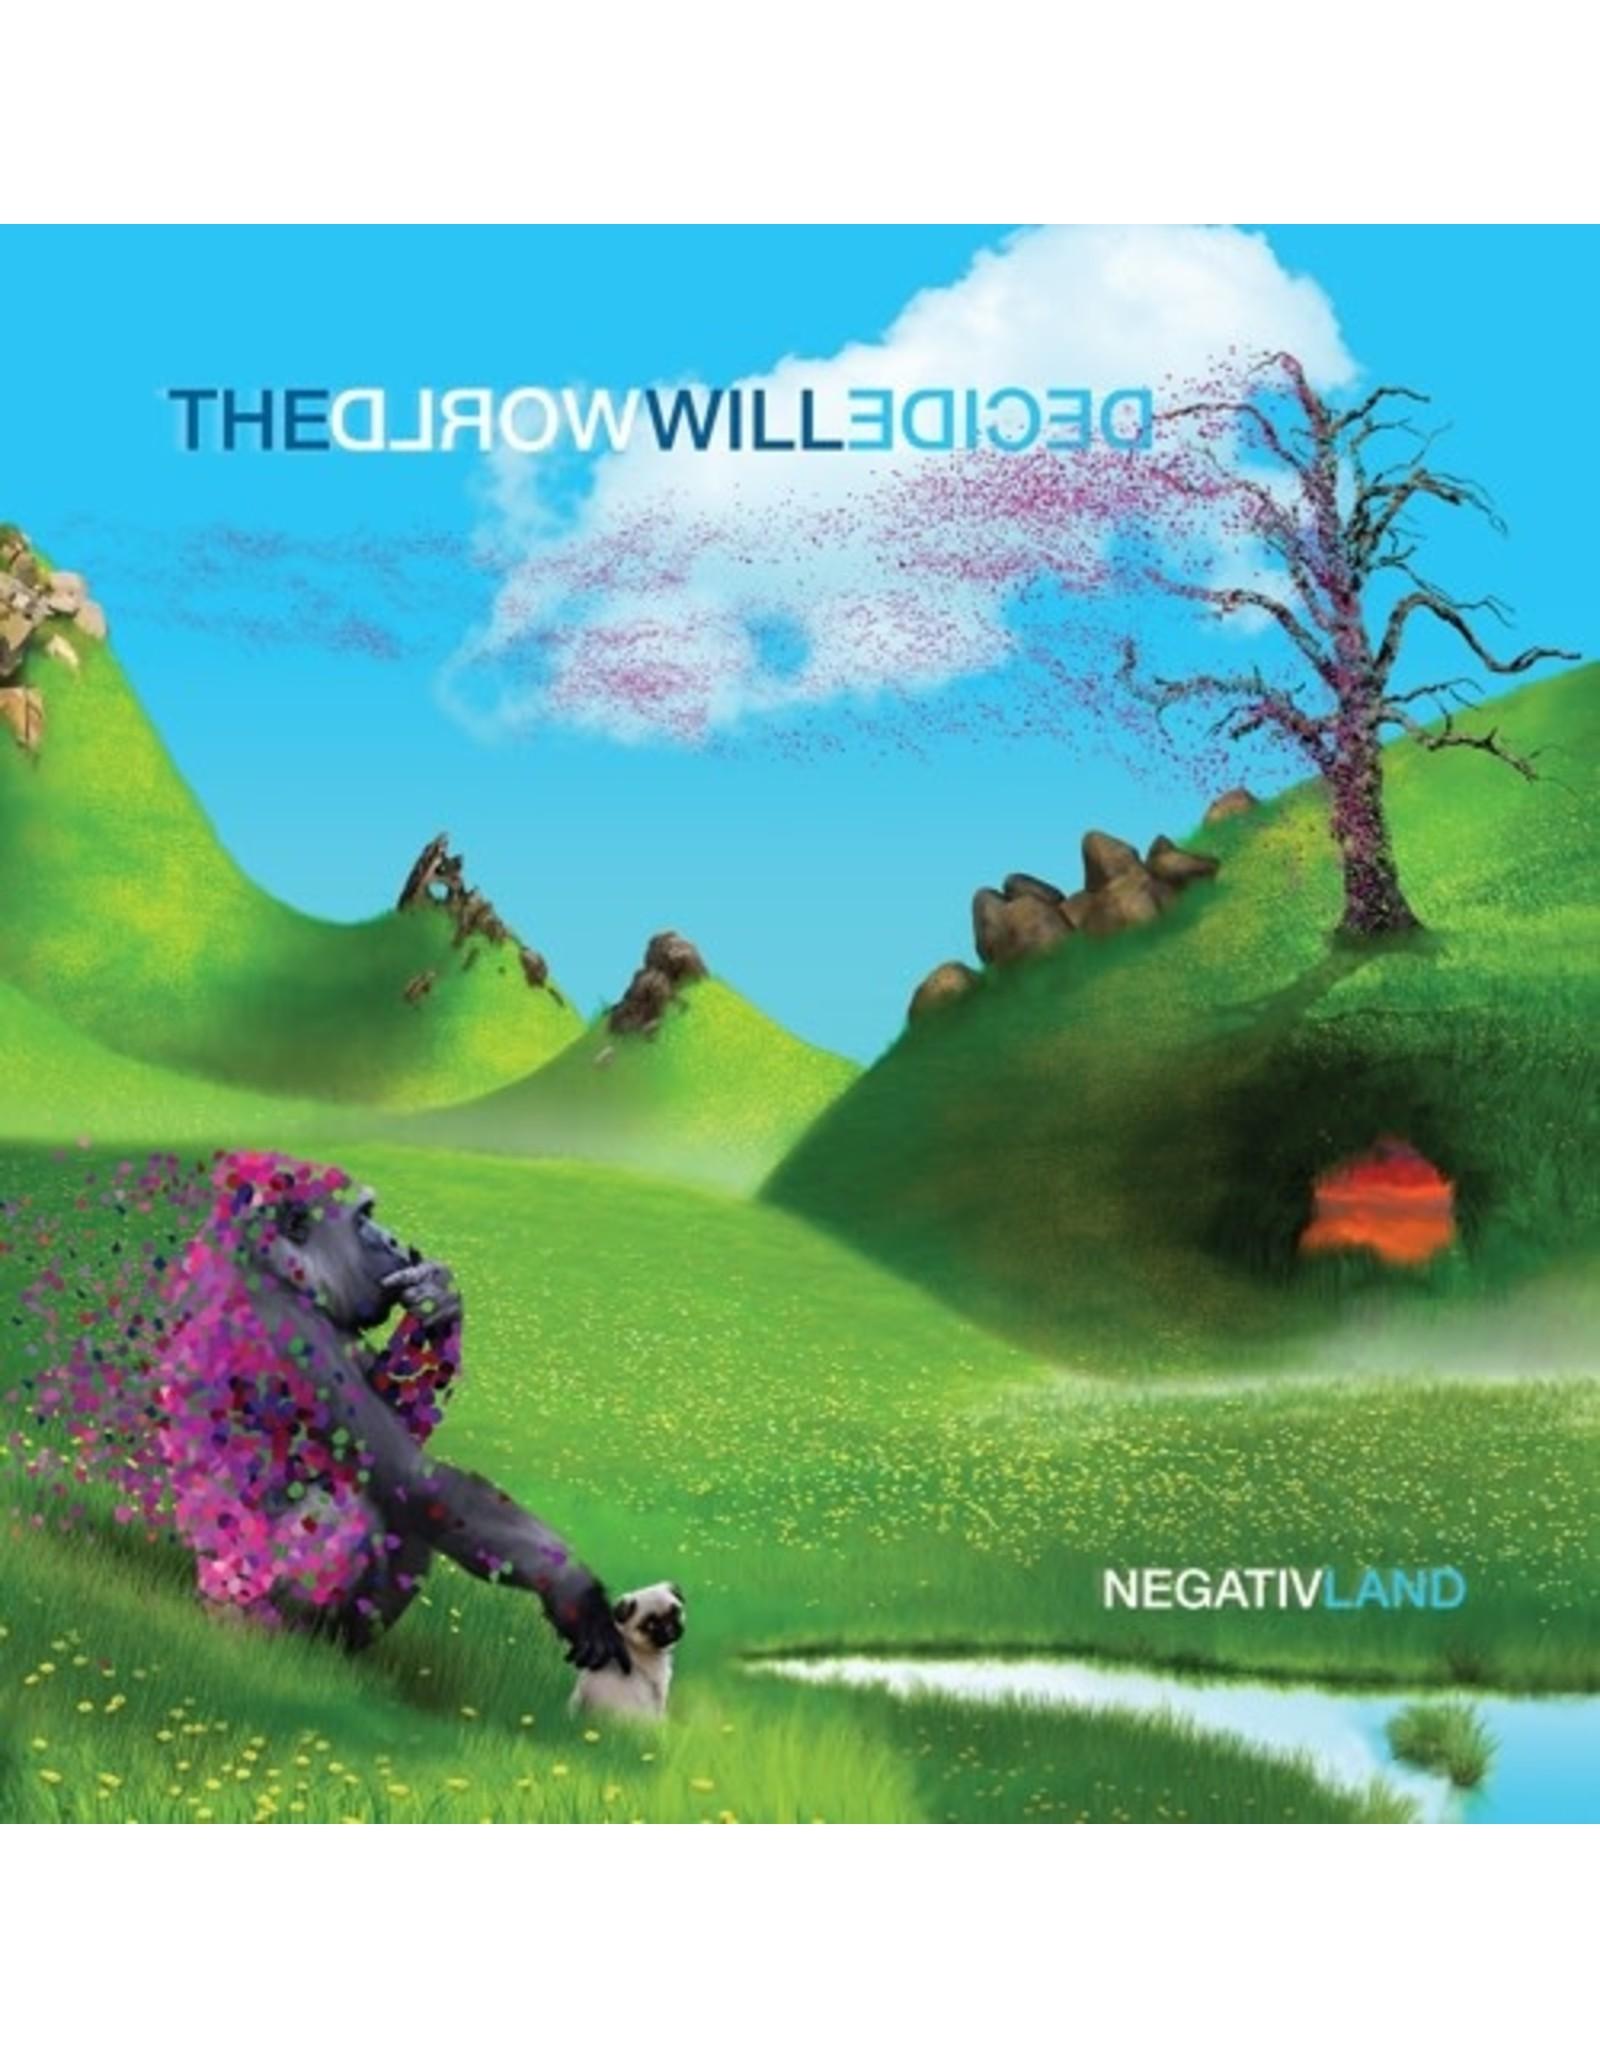 New Vinyl Negativland - The World Will Decide 2LP